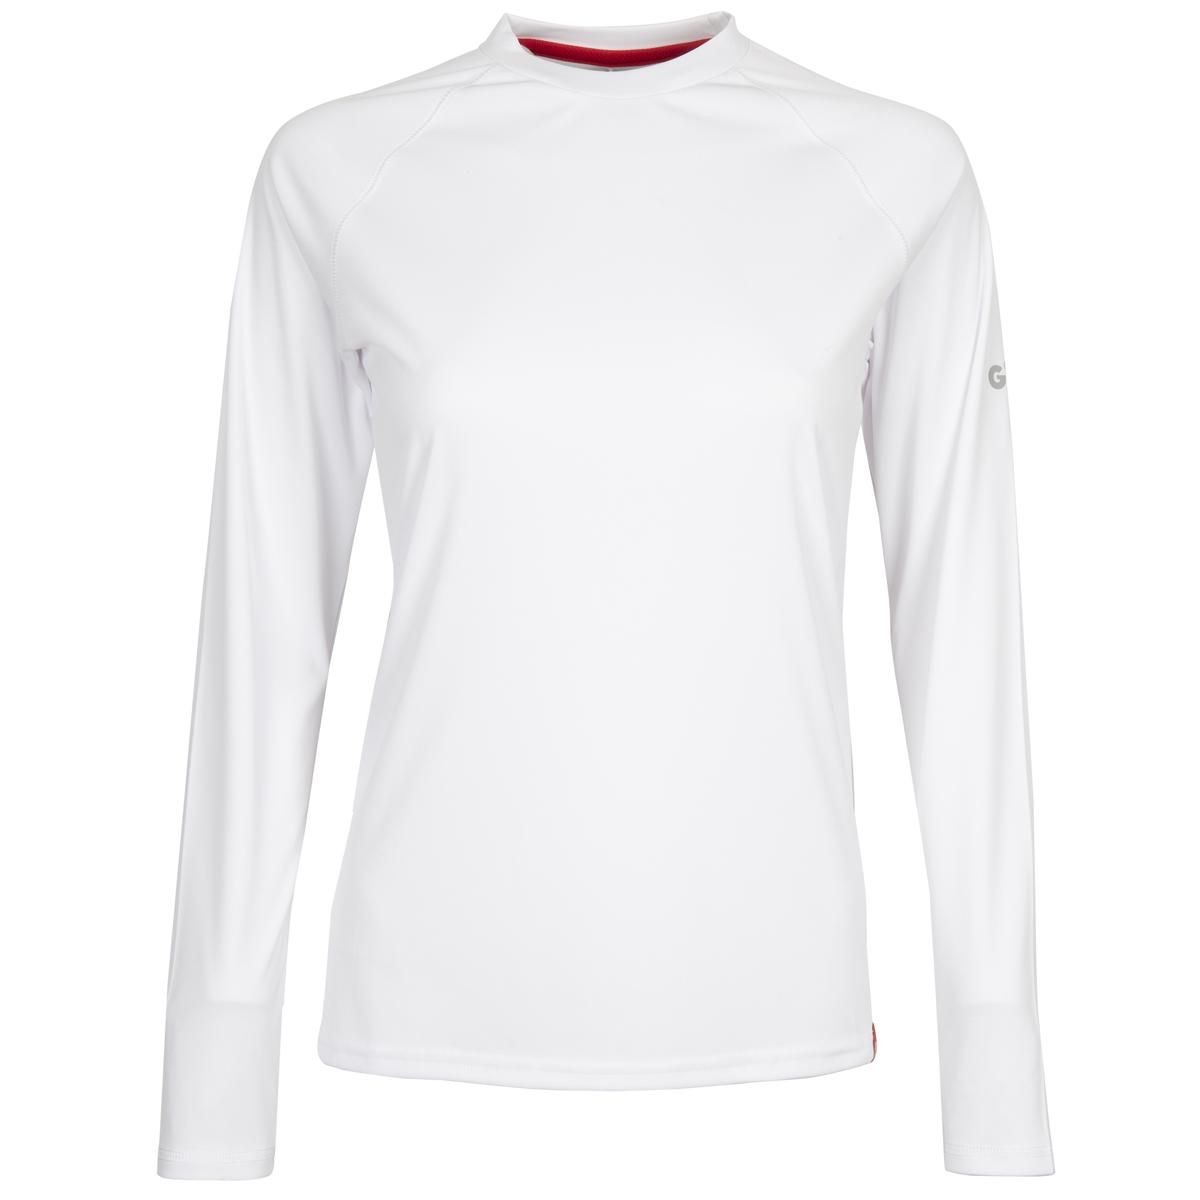 Gill Women's UV Tec Long Sleeve Tee (UV011W)